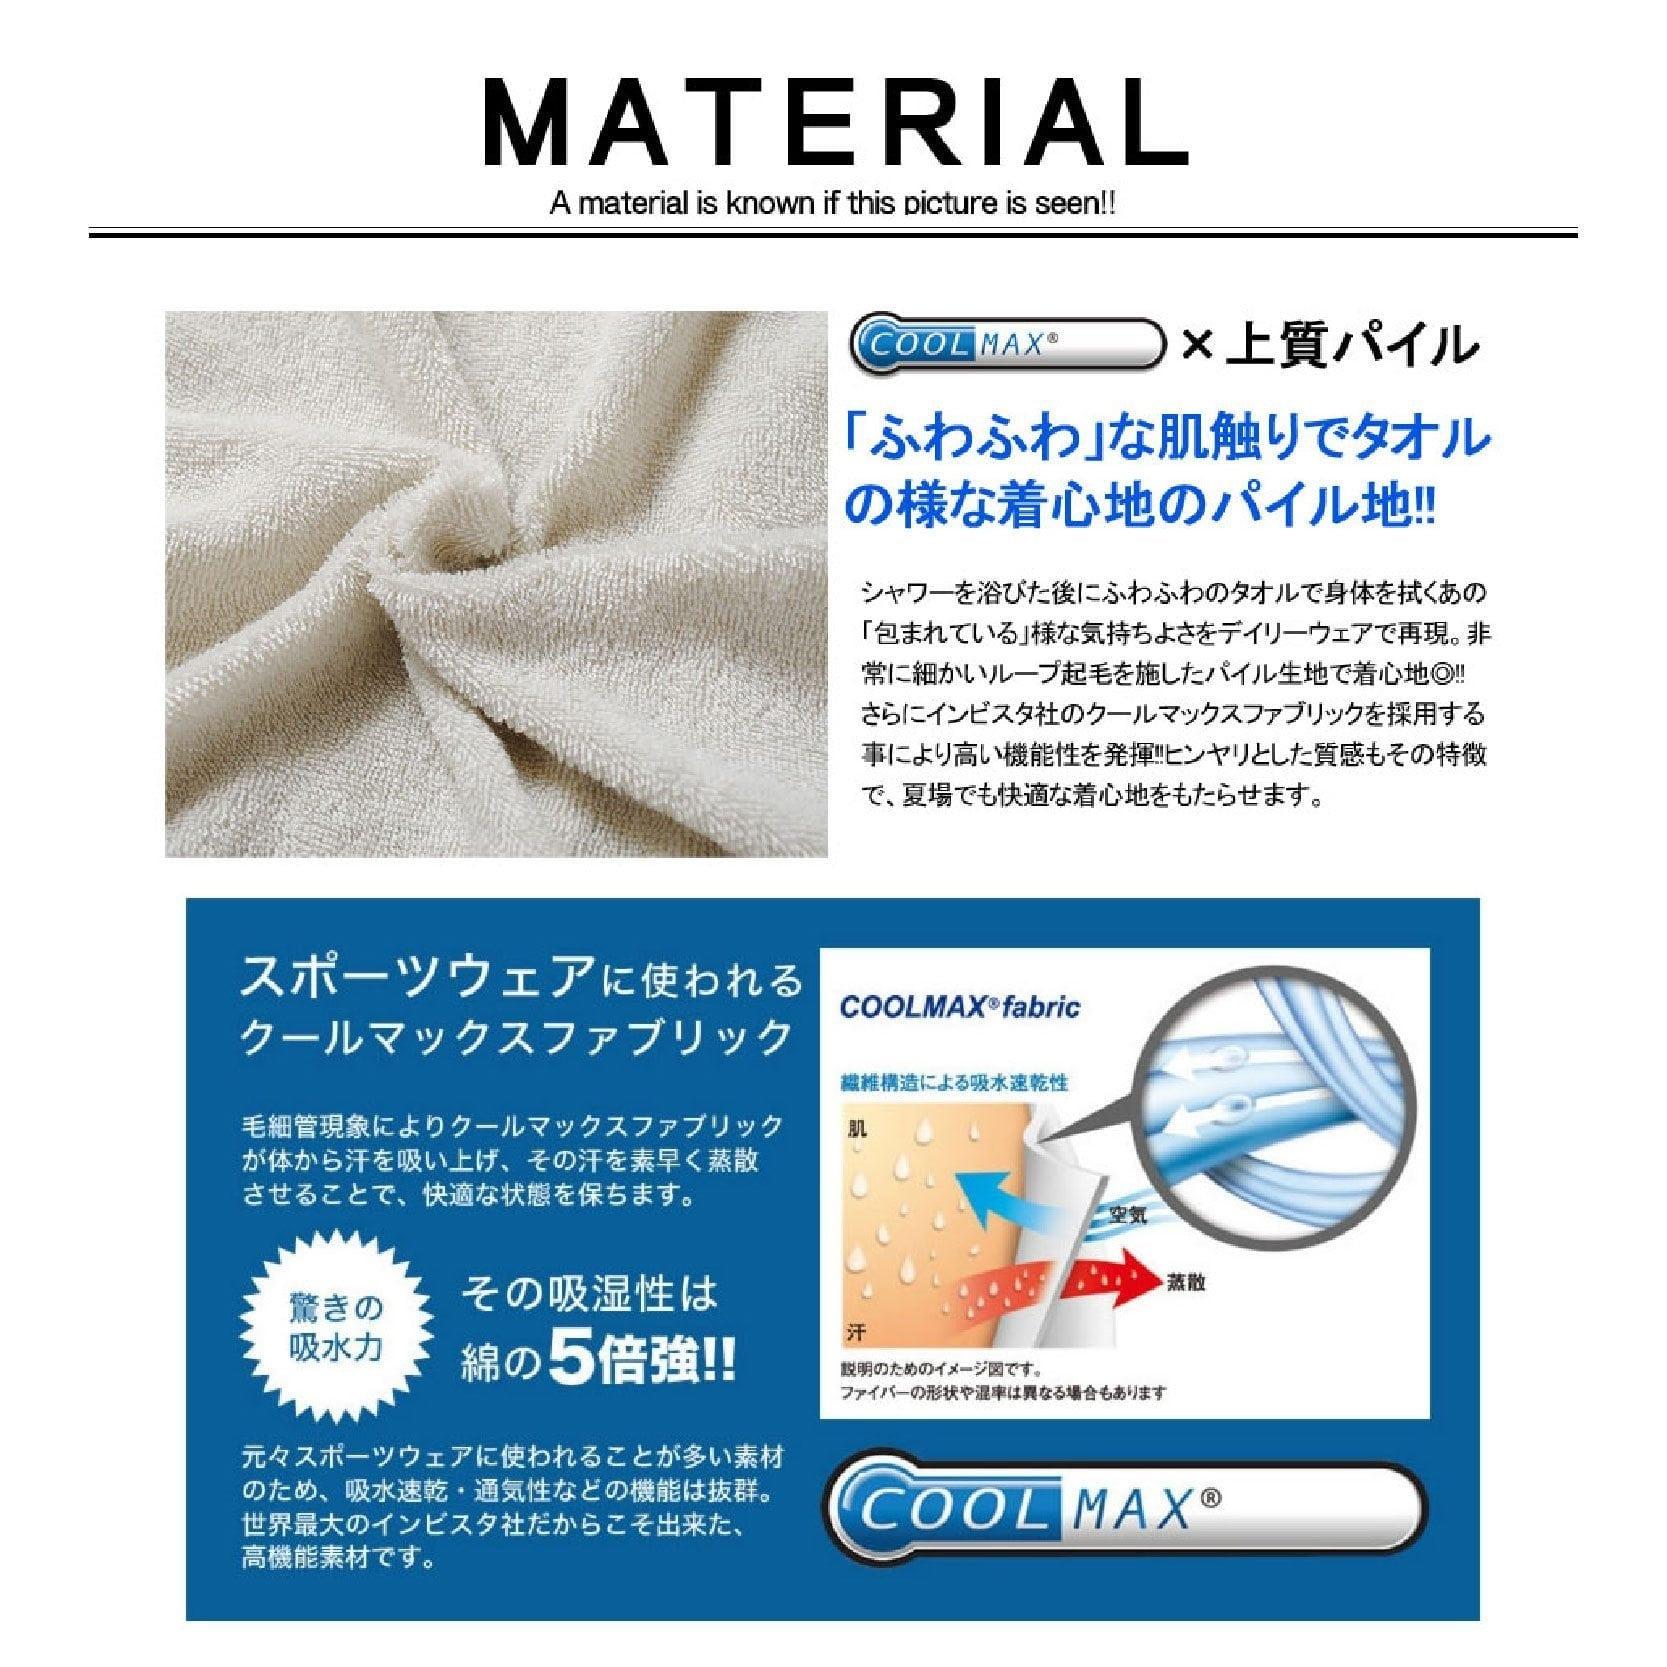 Coolmax Mattress Protector